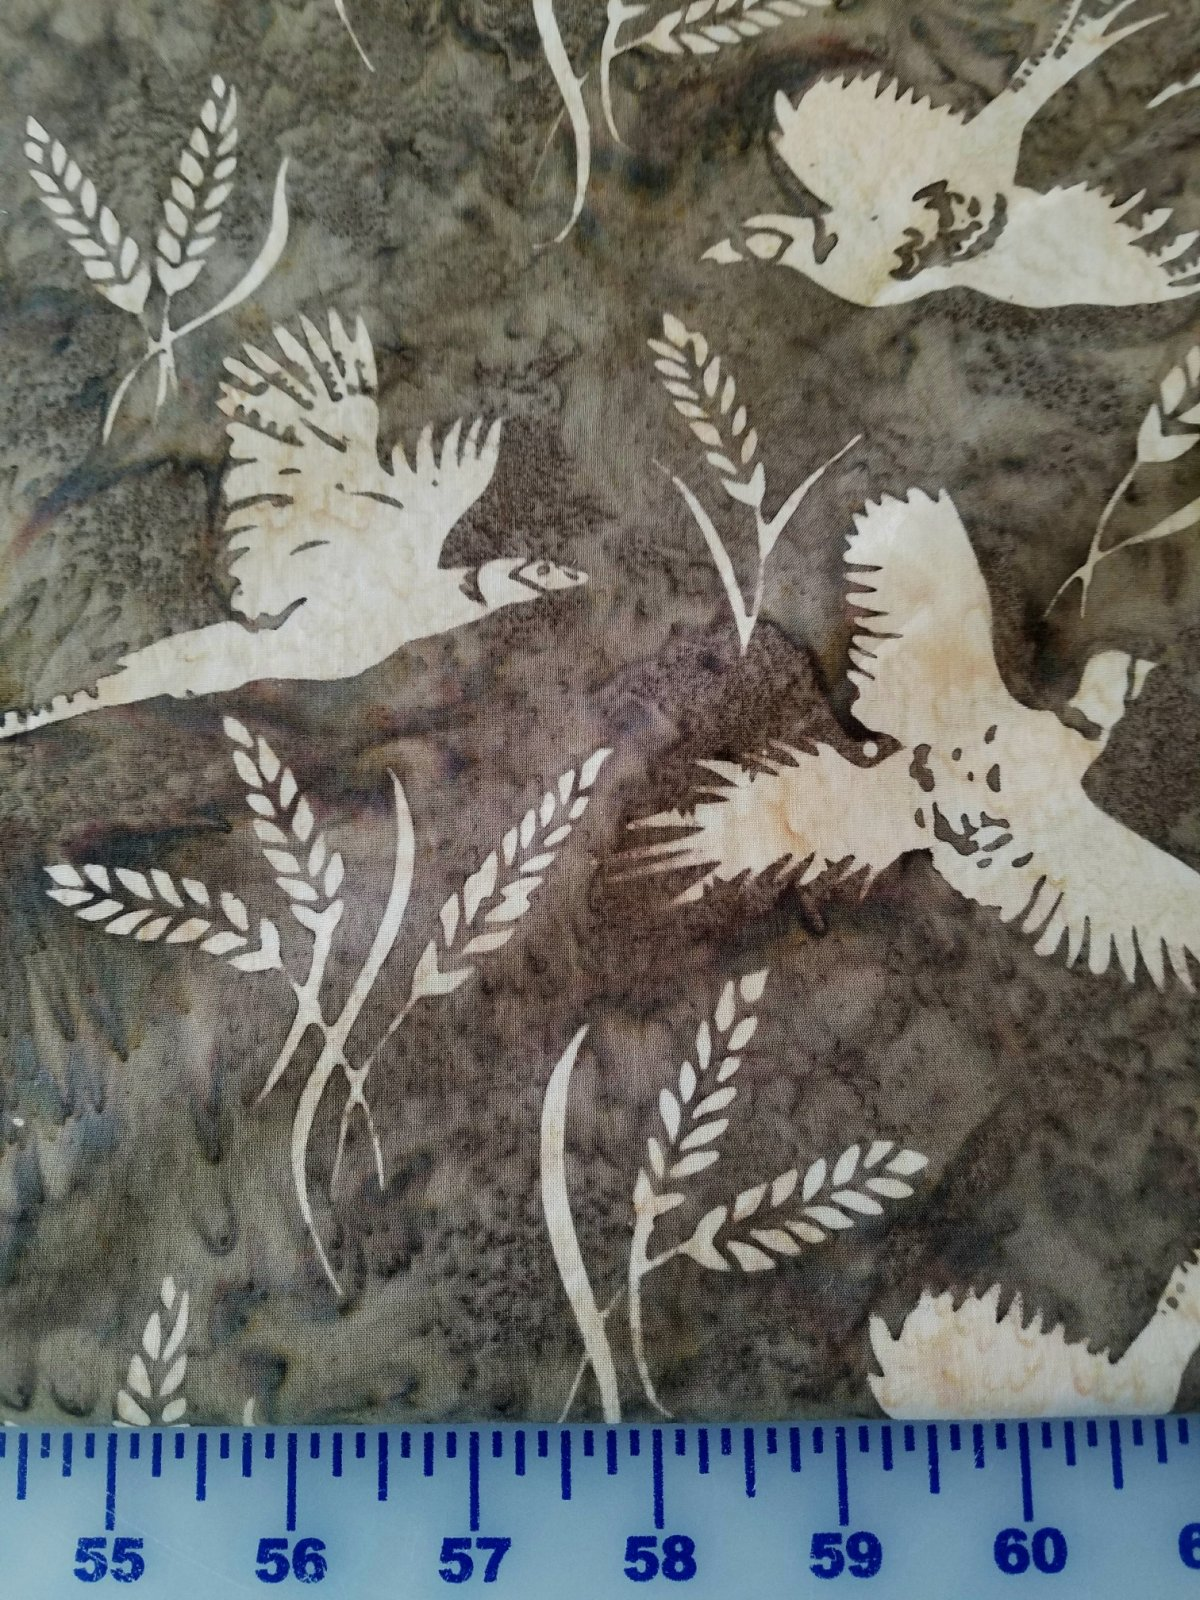 P2085-540 Hoffman of California Pheasants and Wheat Woodstock